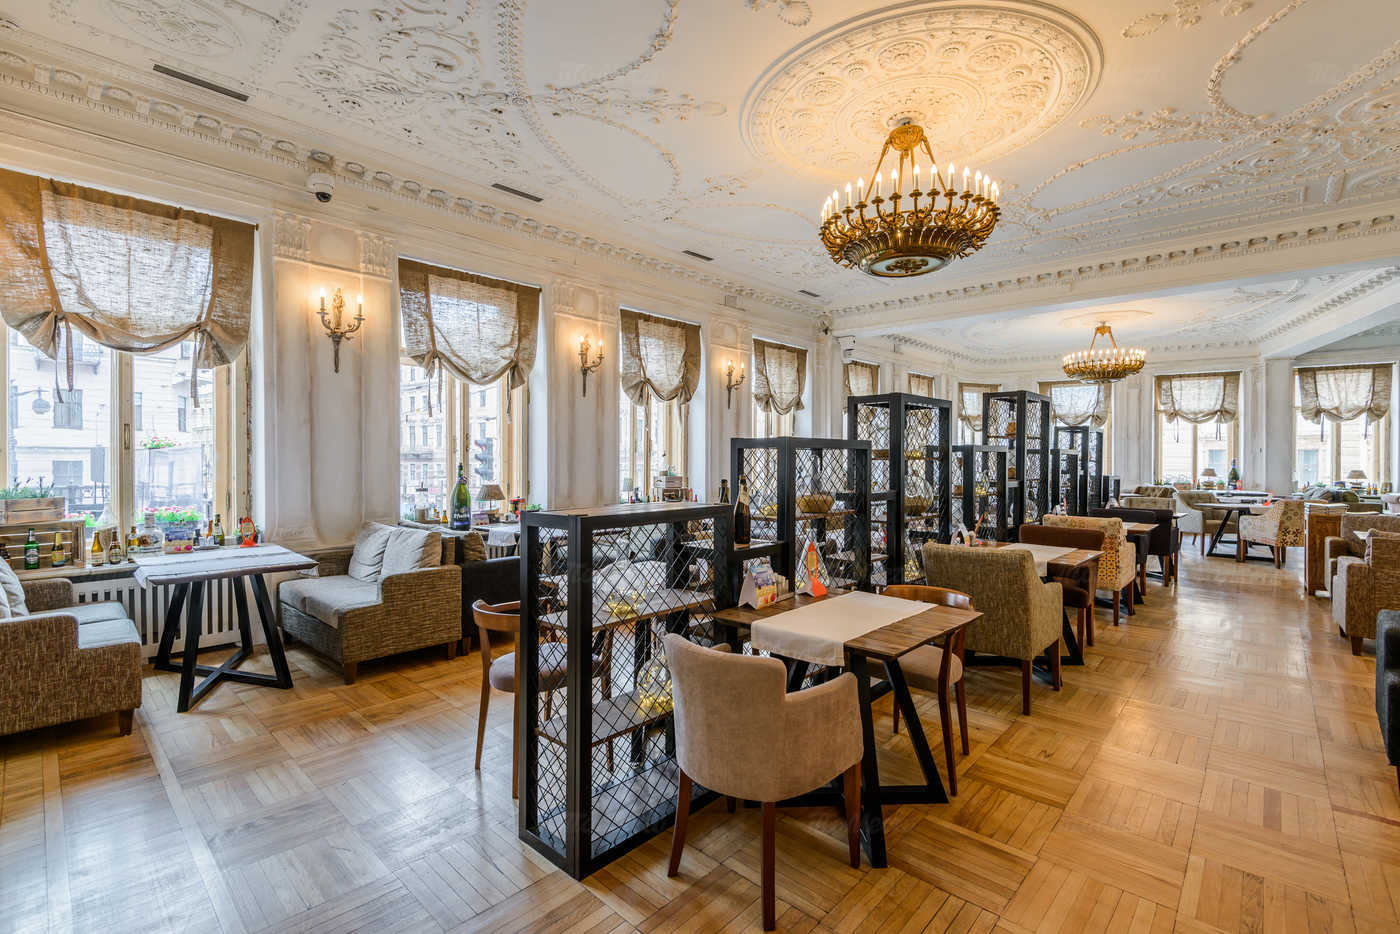 Ресторан Шато Винтаж (Chateau Vintage) на Невском проспекте фото 11